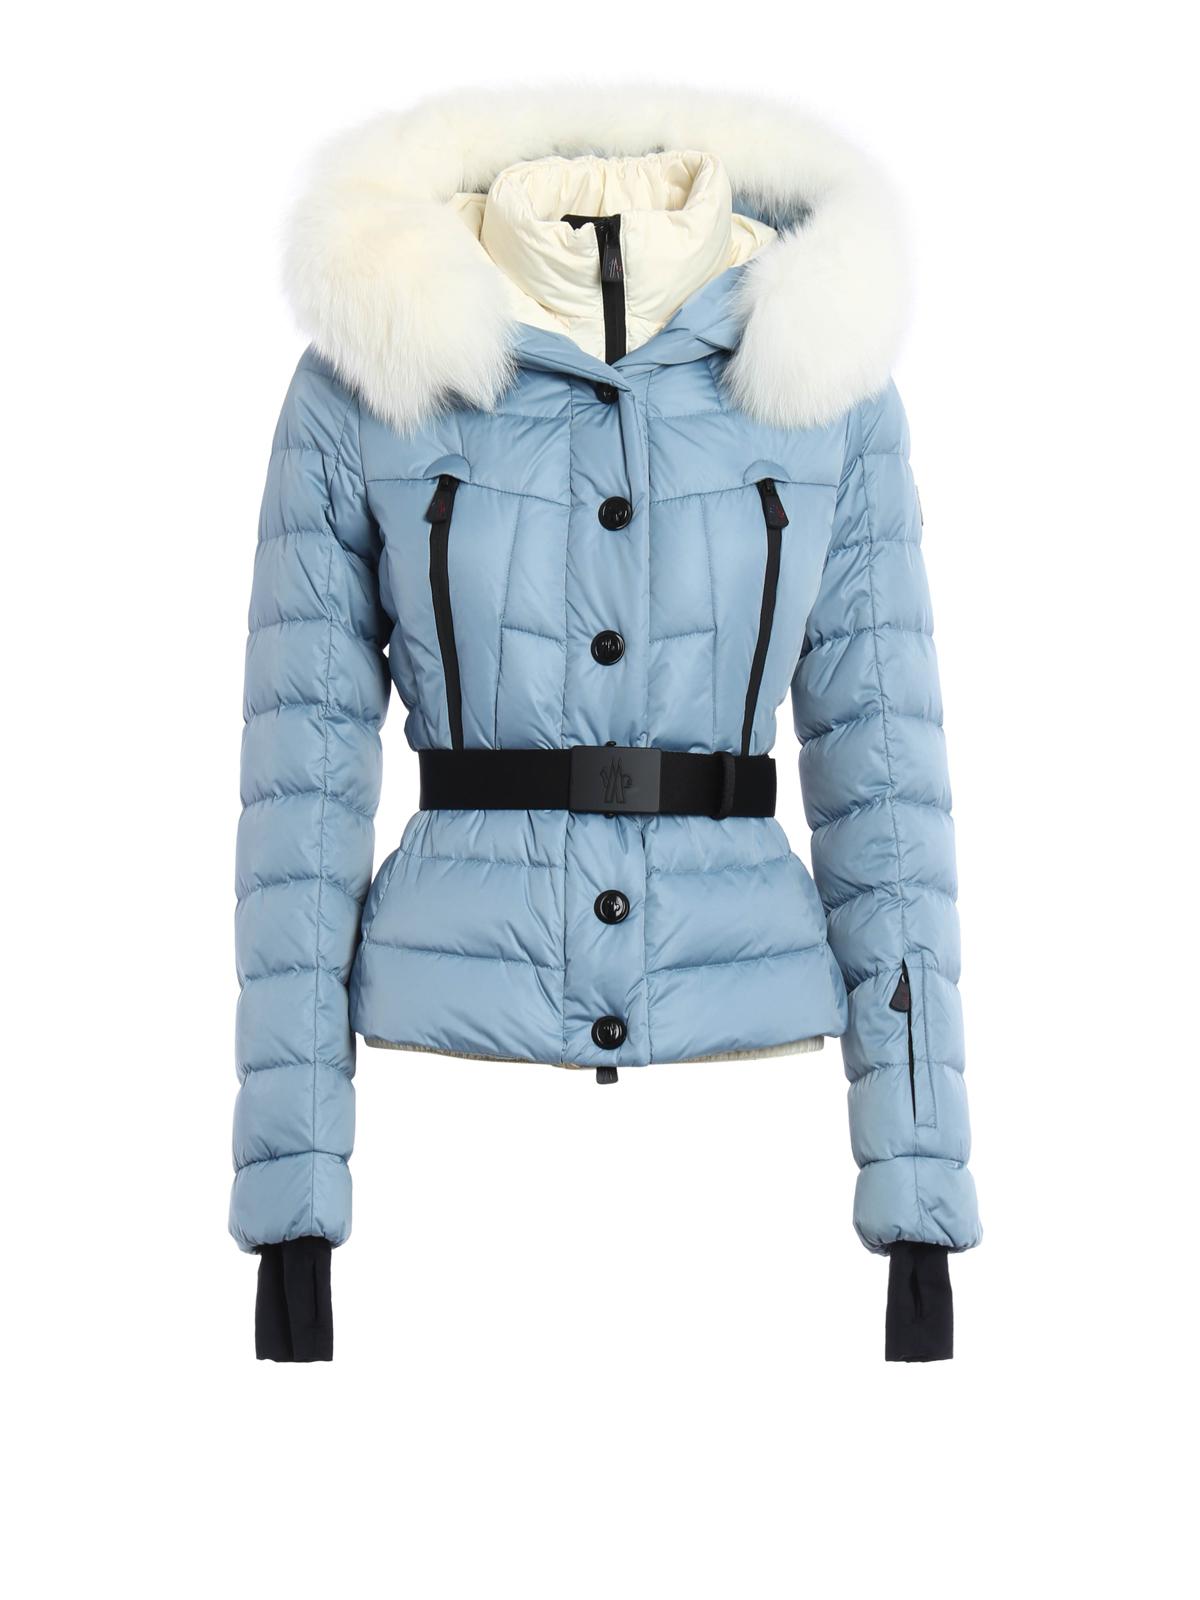 3332d13c3 Moncler Grenoble - Beverley fur trim hooded jacket - padded jackets ...